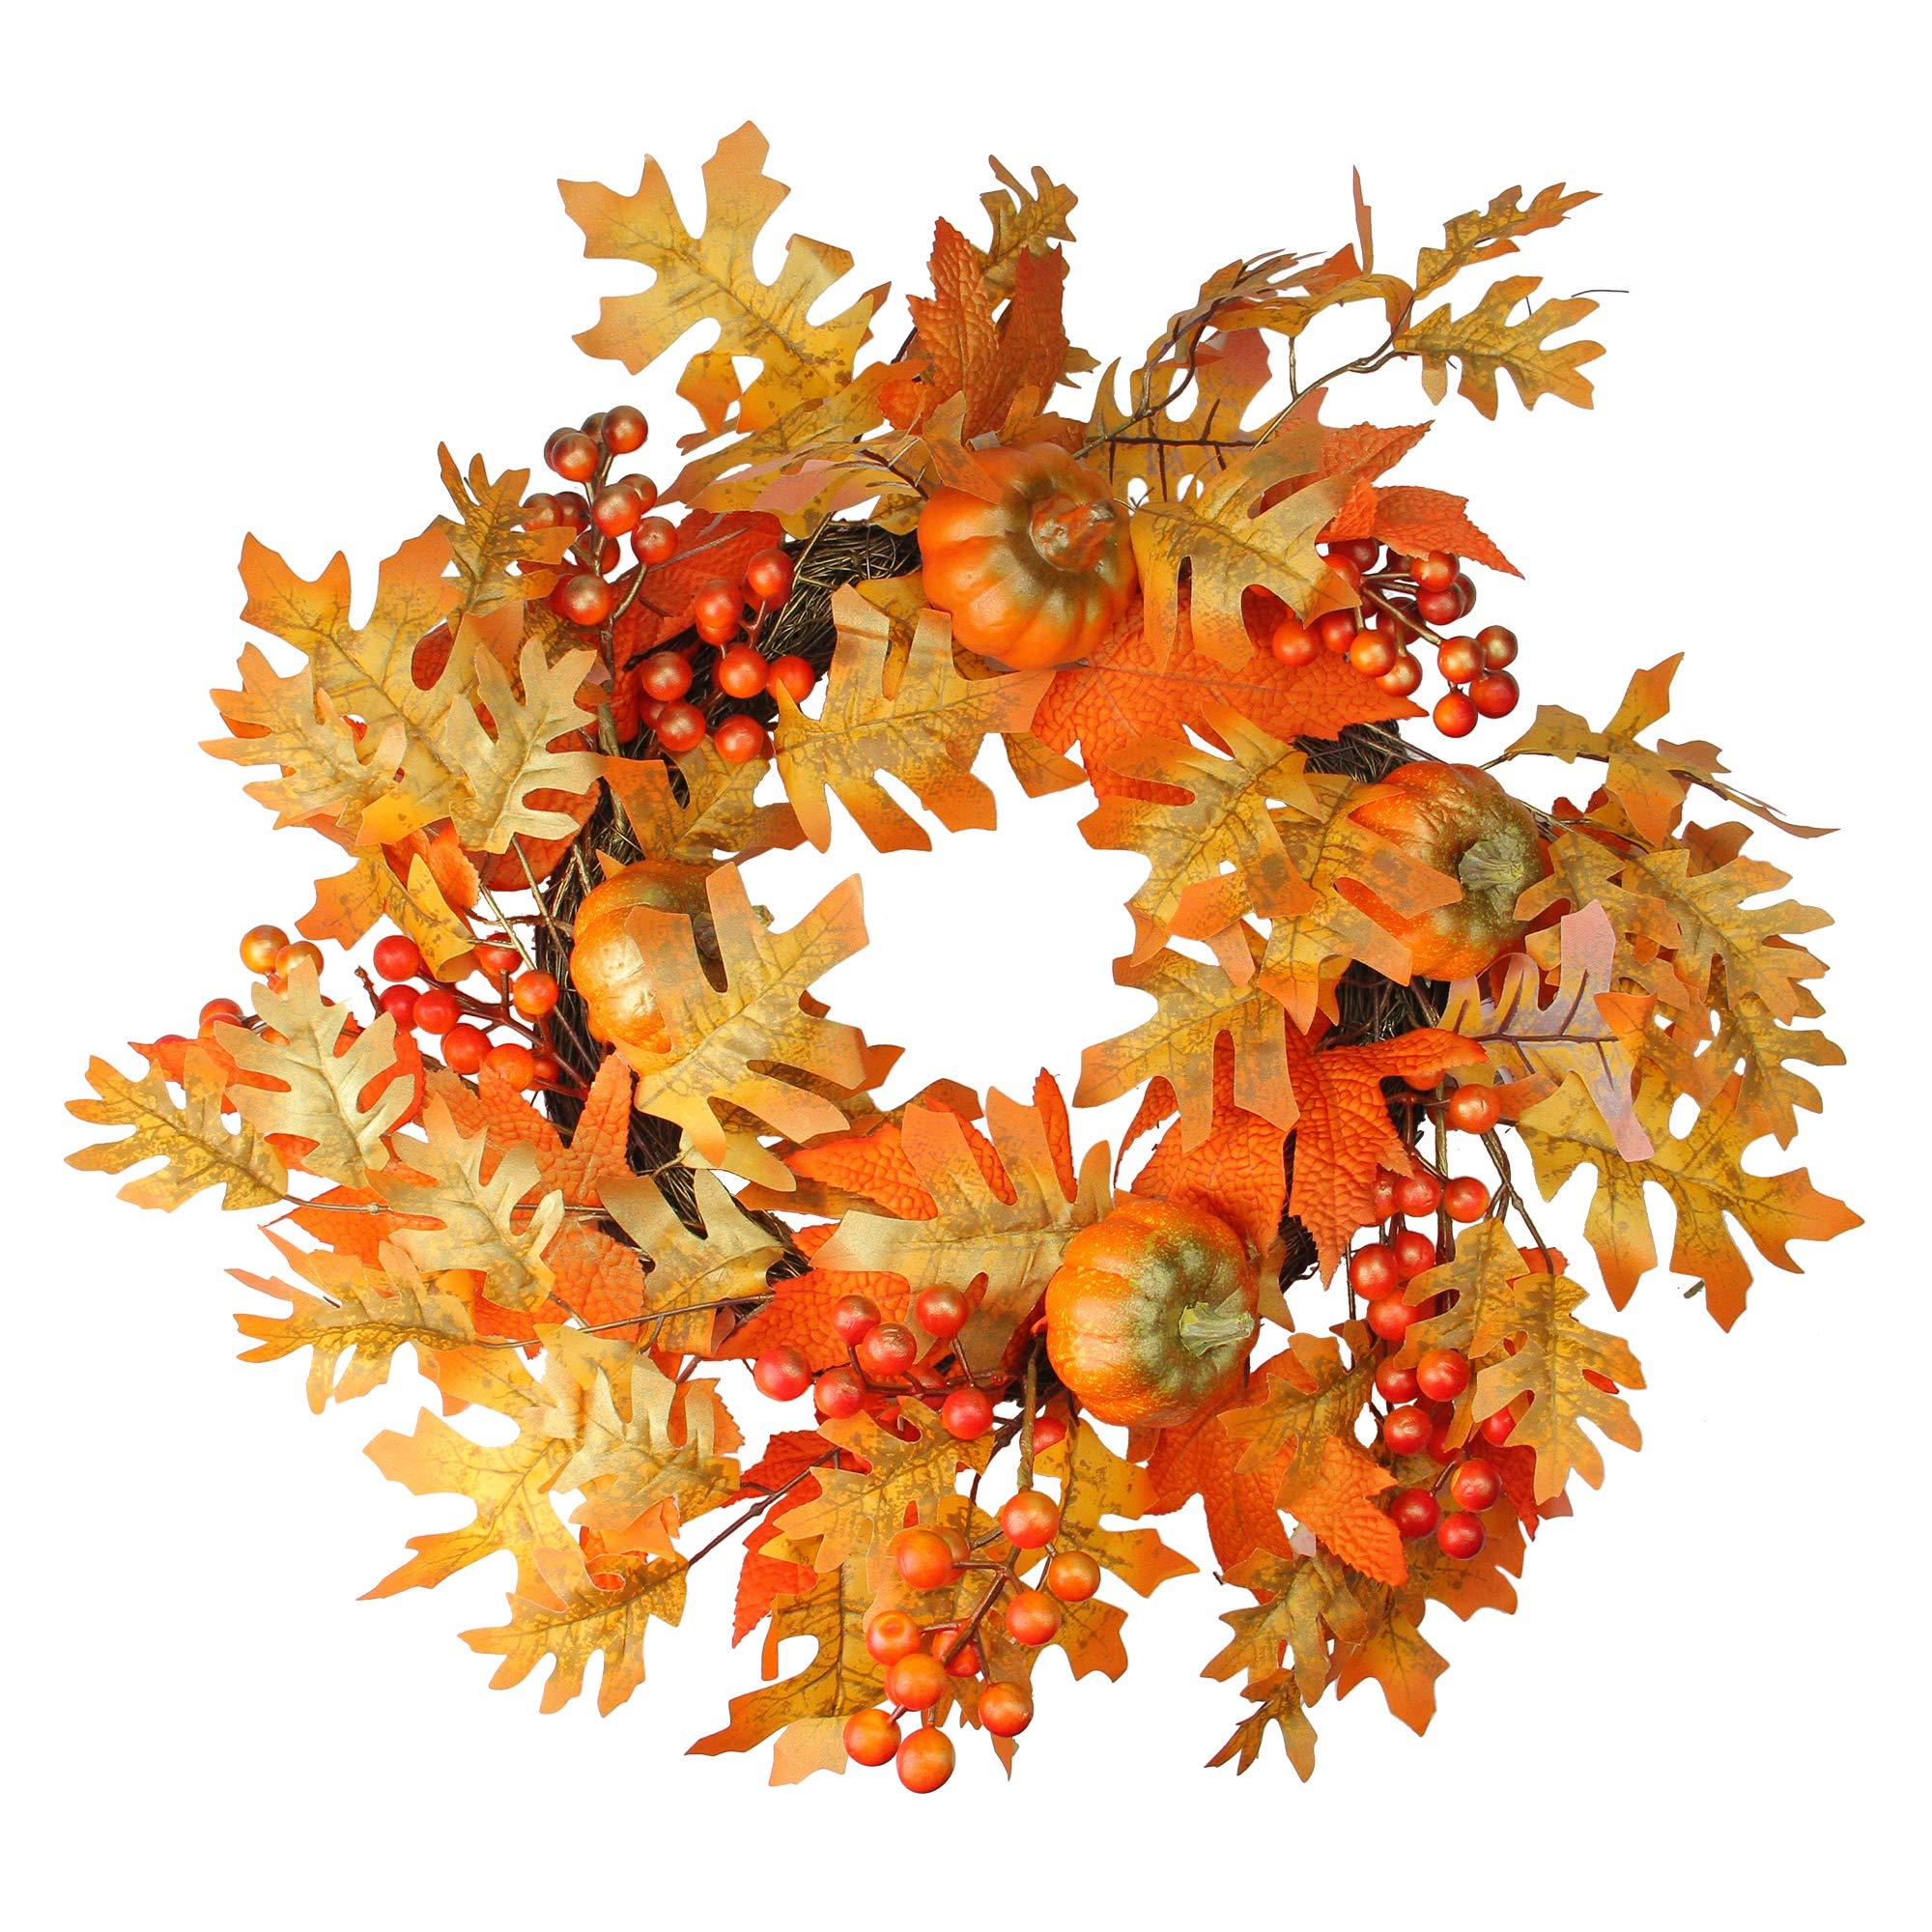 NORTHLIGHT VM37827 22'' Autumn Harvest Decorative Artifi by Northlight